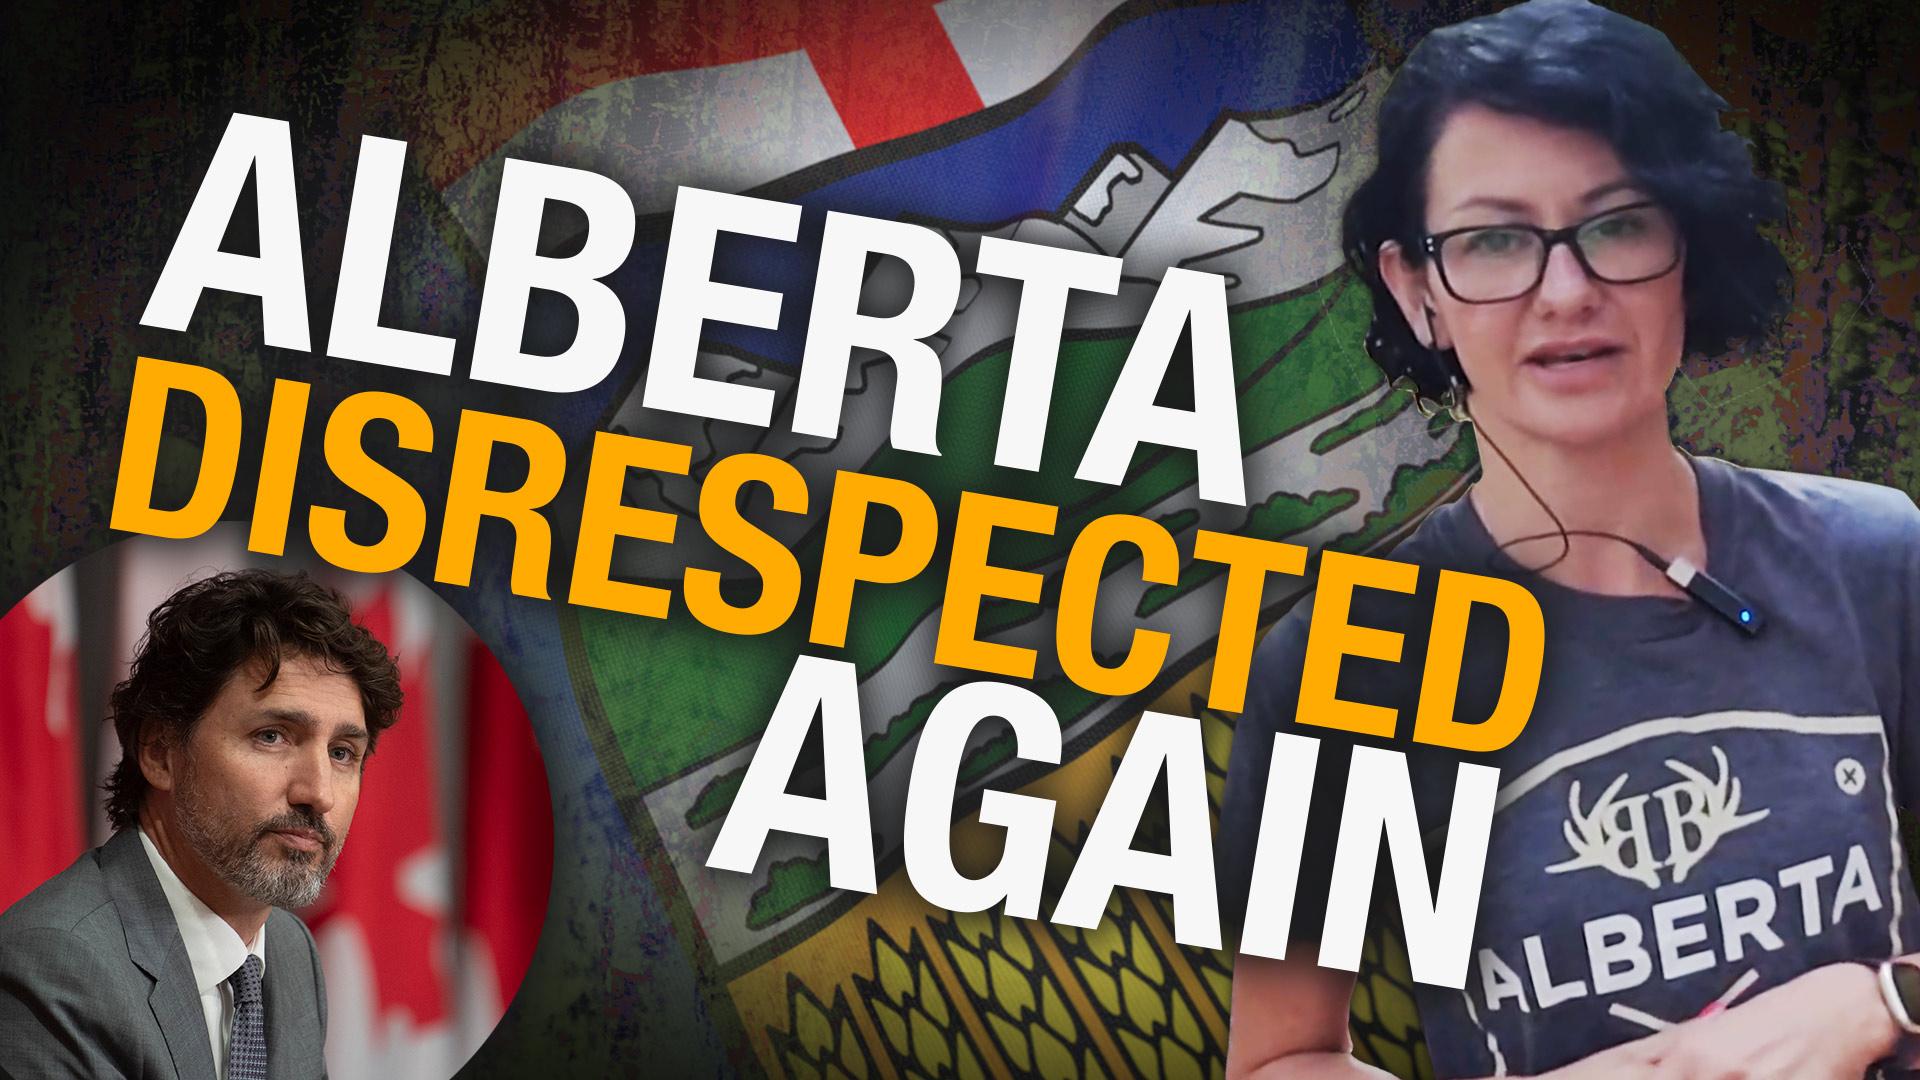 Trudeau insults Albertans by ignoring senator voting tradition, appoints his own Liberal senator